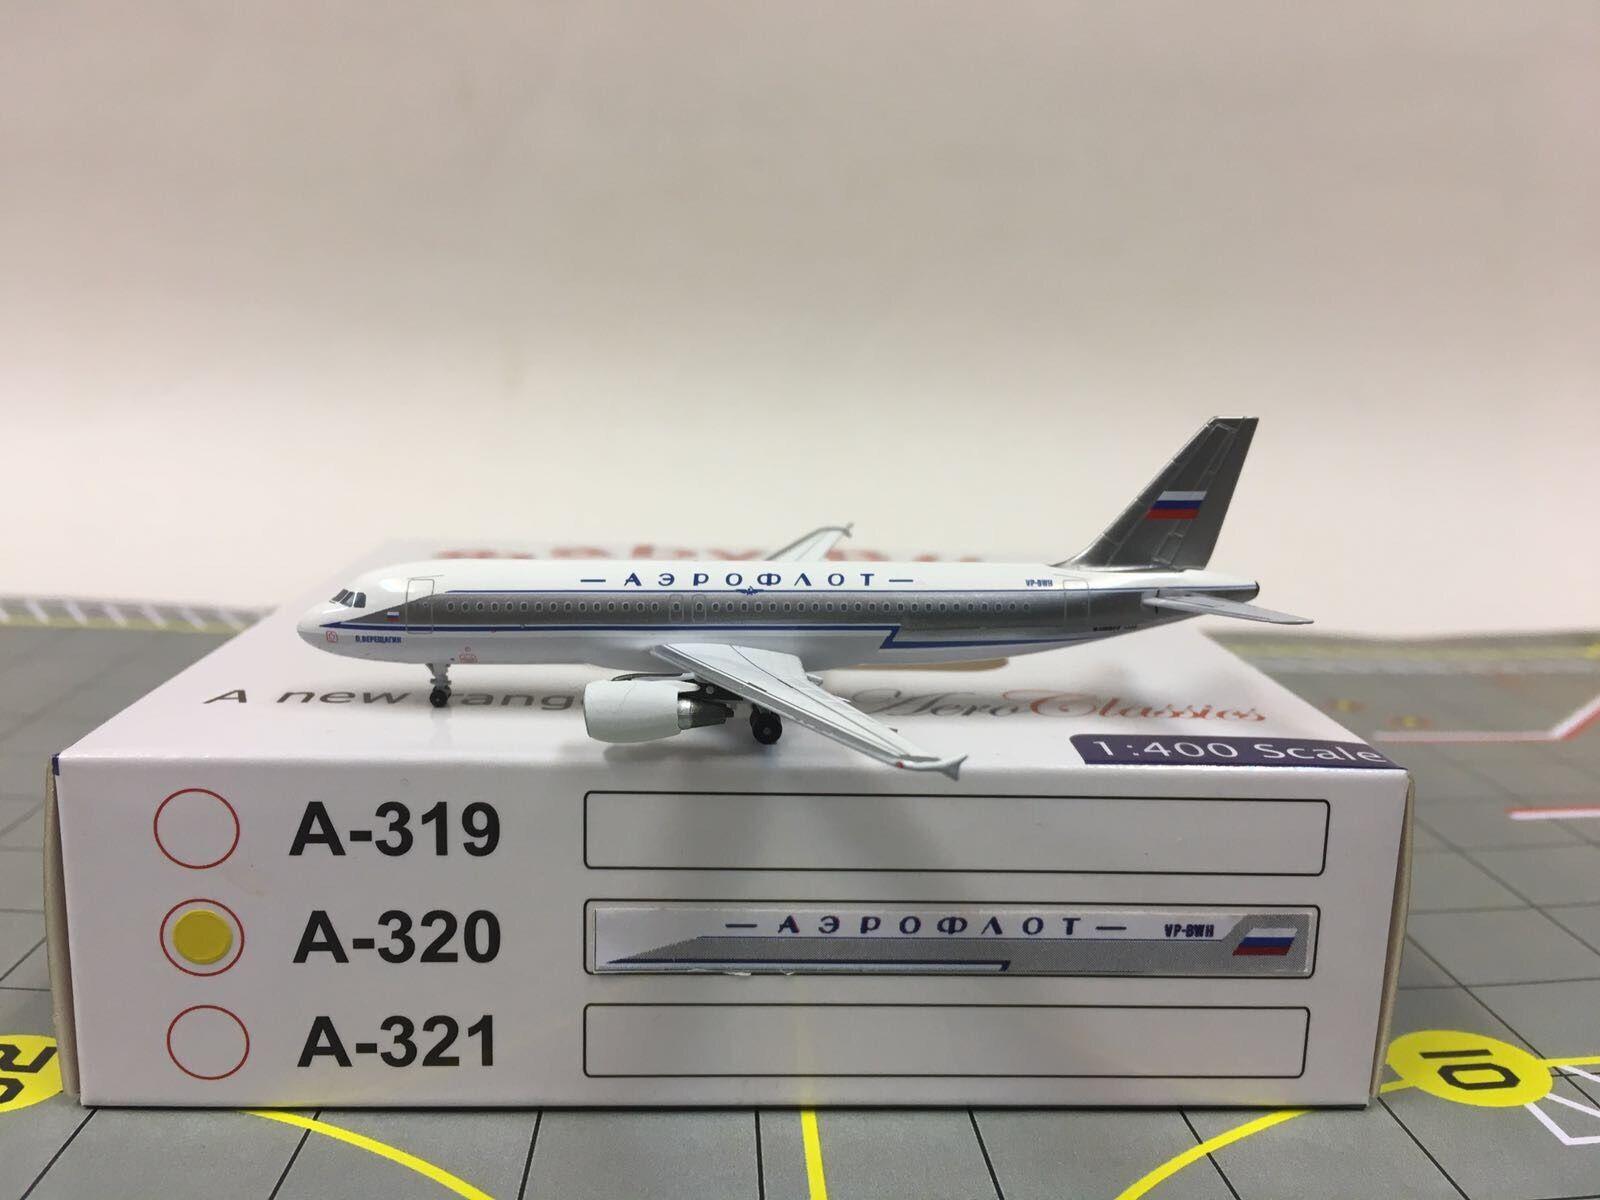 Aeroclassics 1 400 Aeroflot Airbus A320 A320 A320  Retro colors  VP-BWH db8e2c